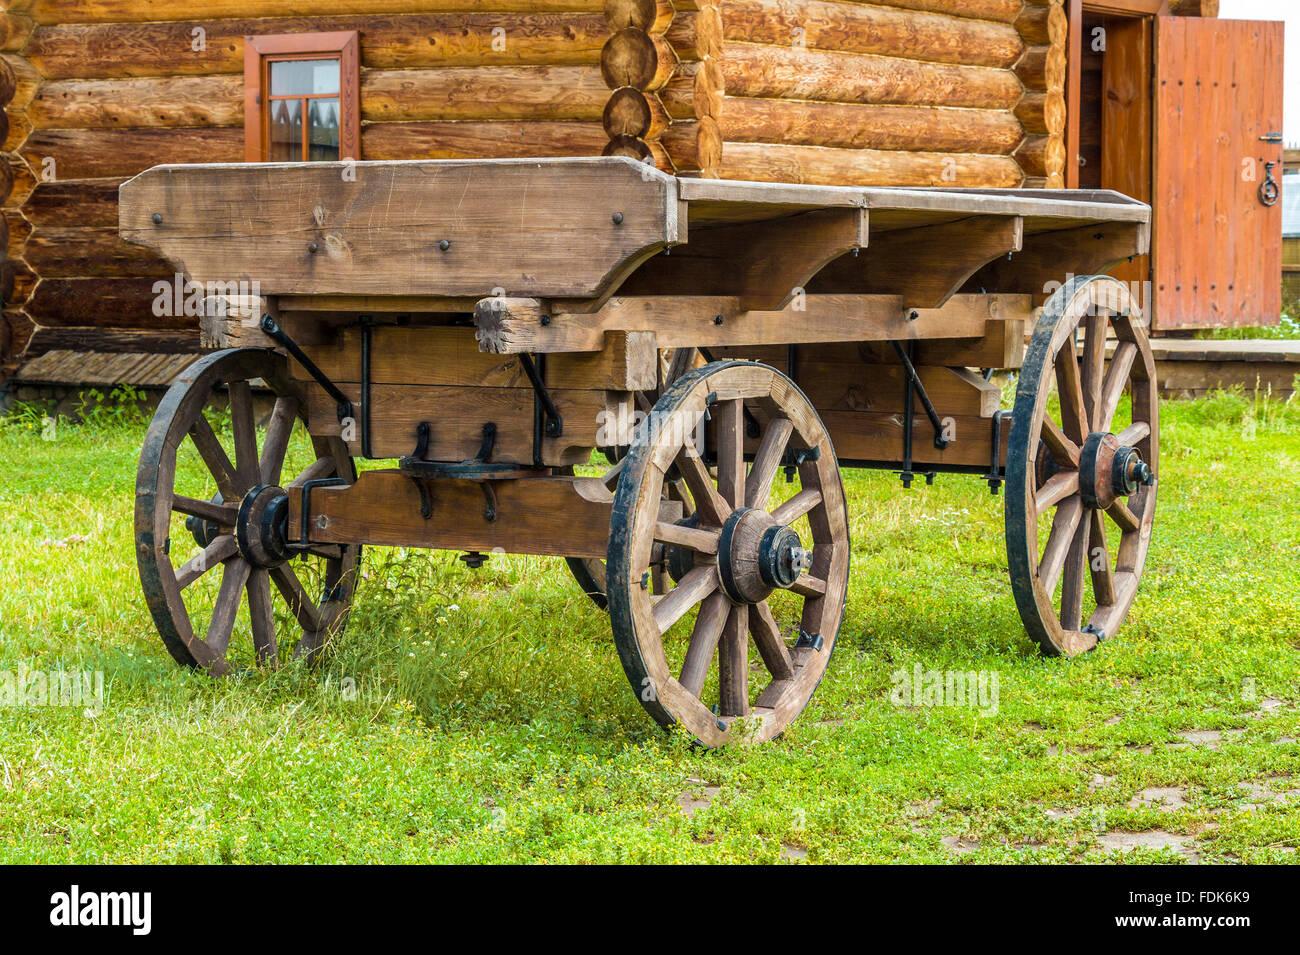 Old Farm Cart Stock Photos & Old Farm Cart Stock Images - Alamy